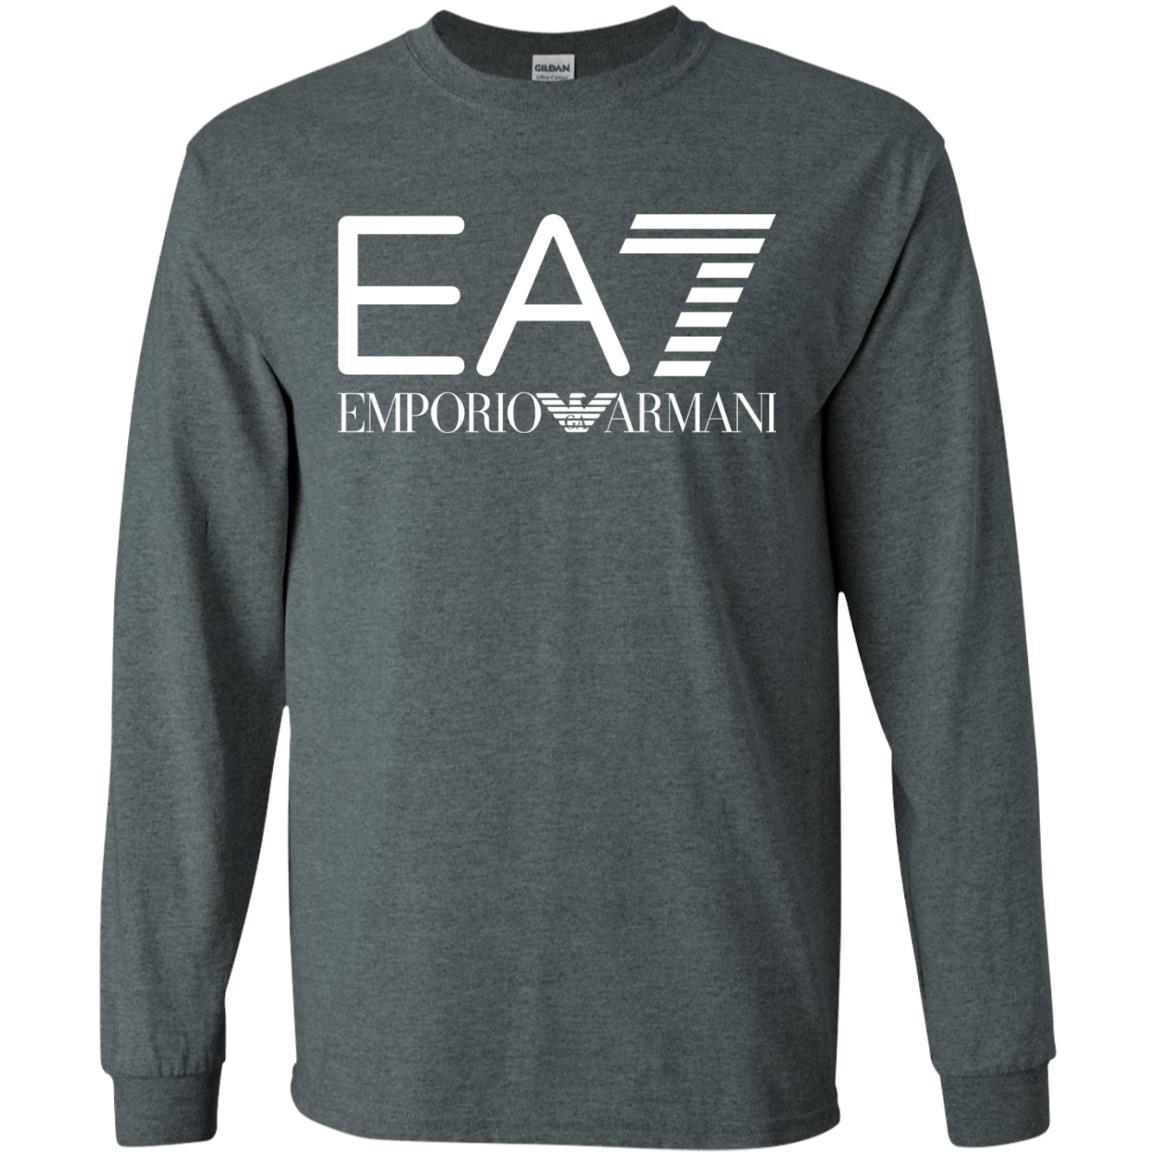 54e88b19bbc9 Emporio Armani Ea7 t shirt, long sleeve, hoodie - RobinPlaceFabrics